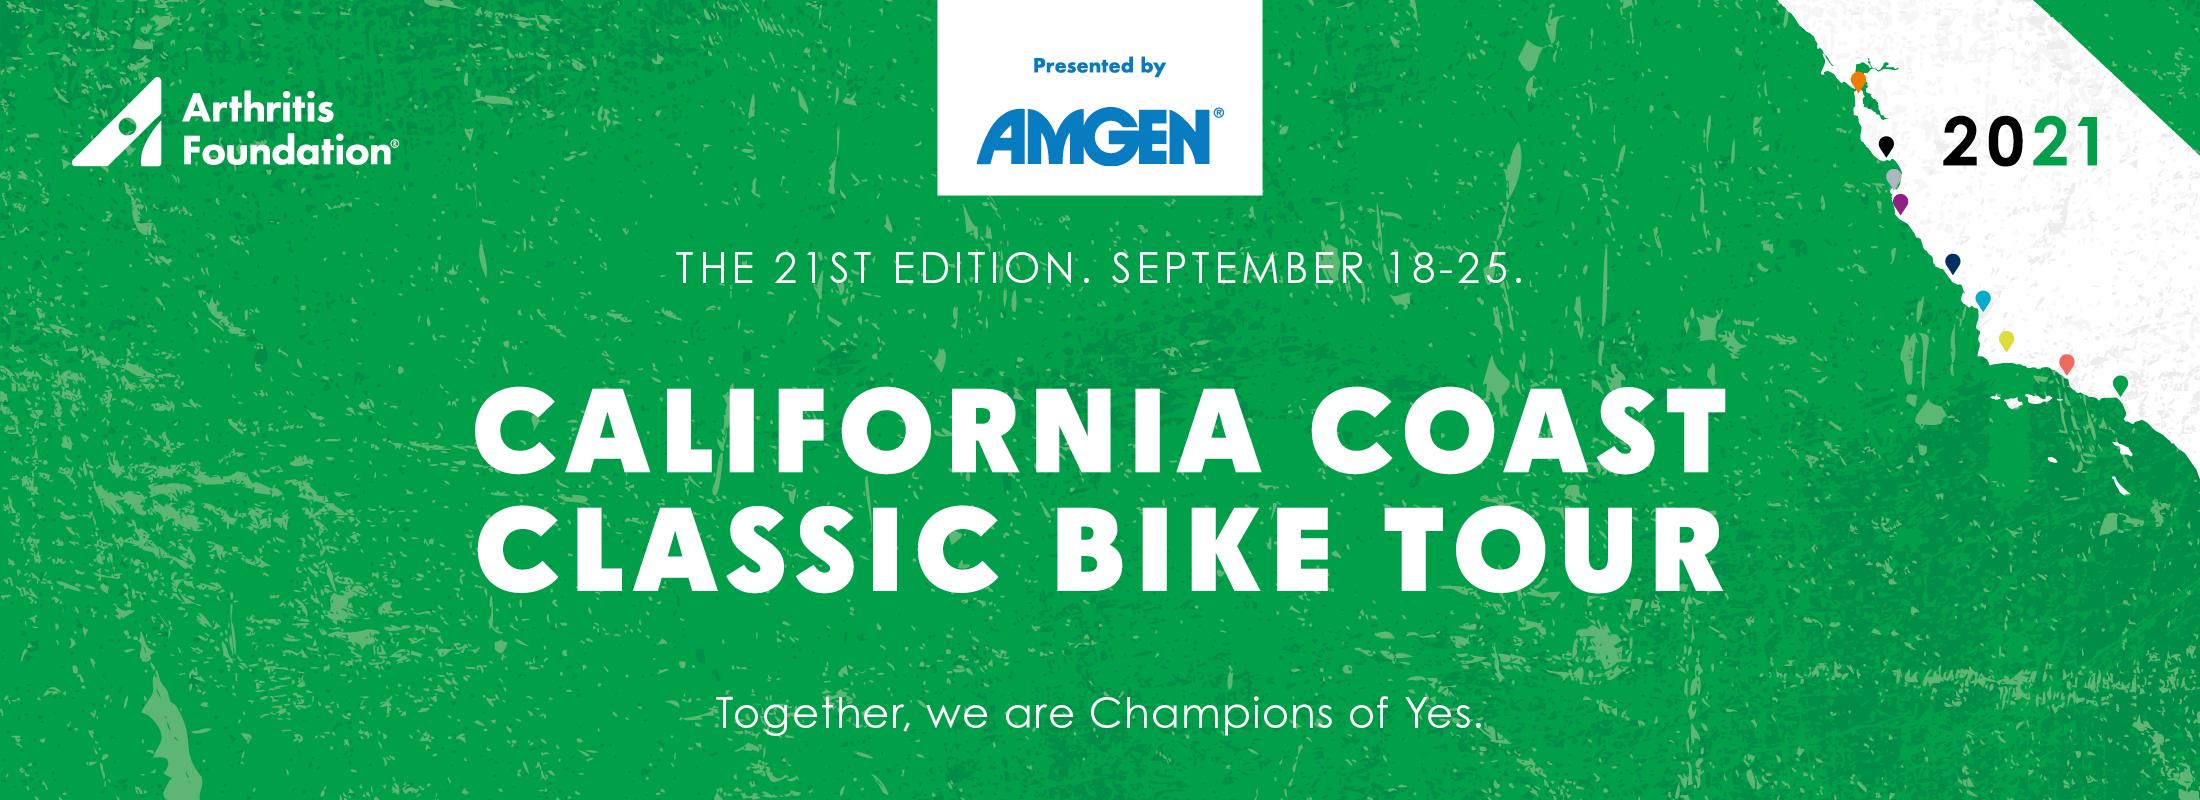 2021 California Coast Classic Bike Tour